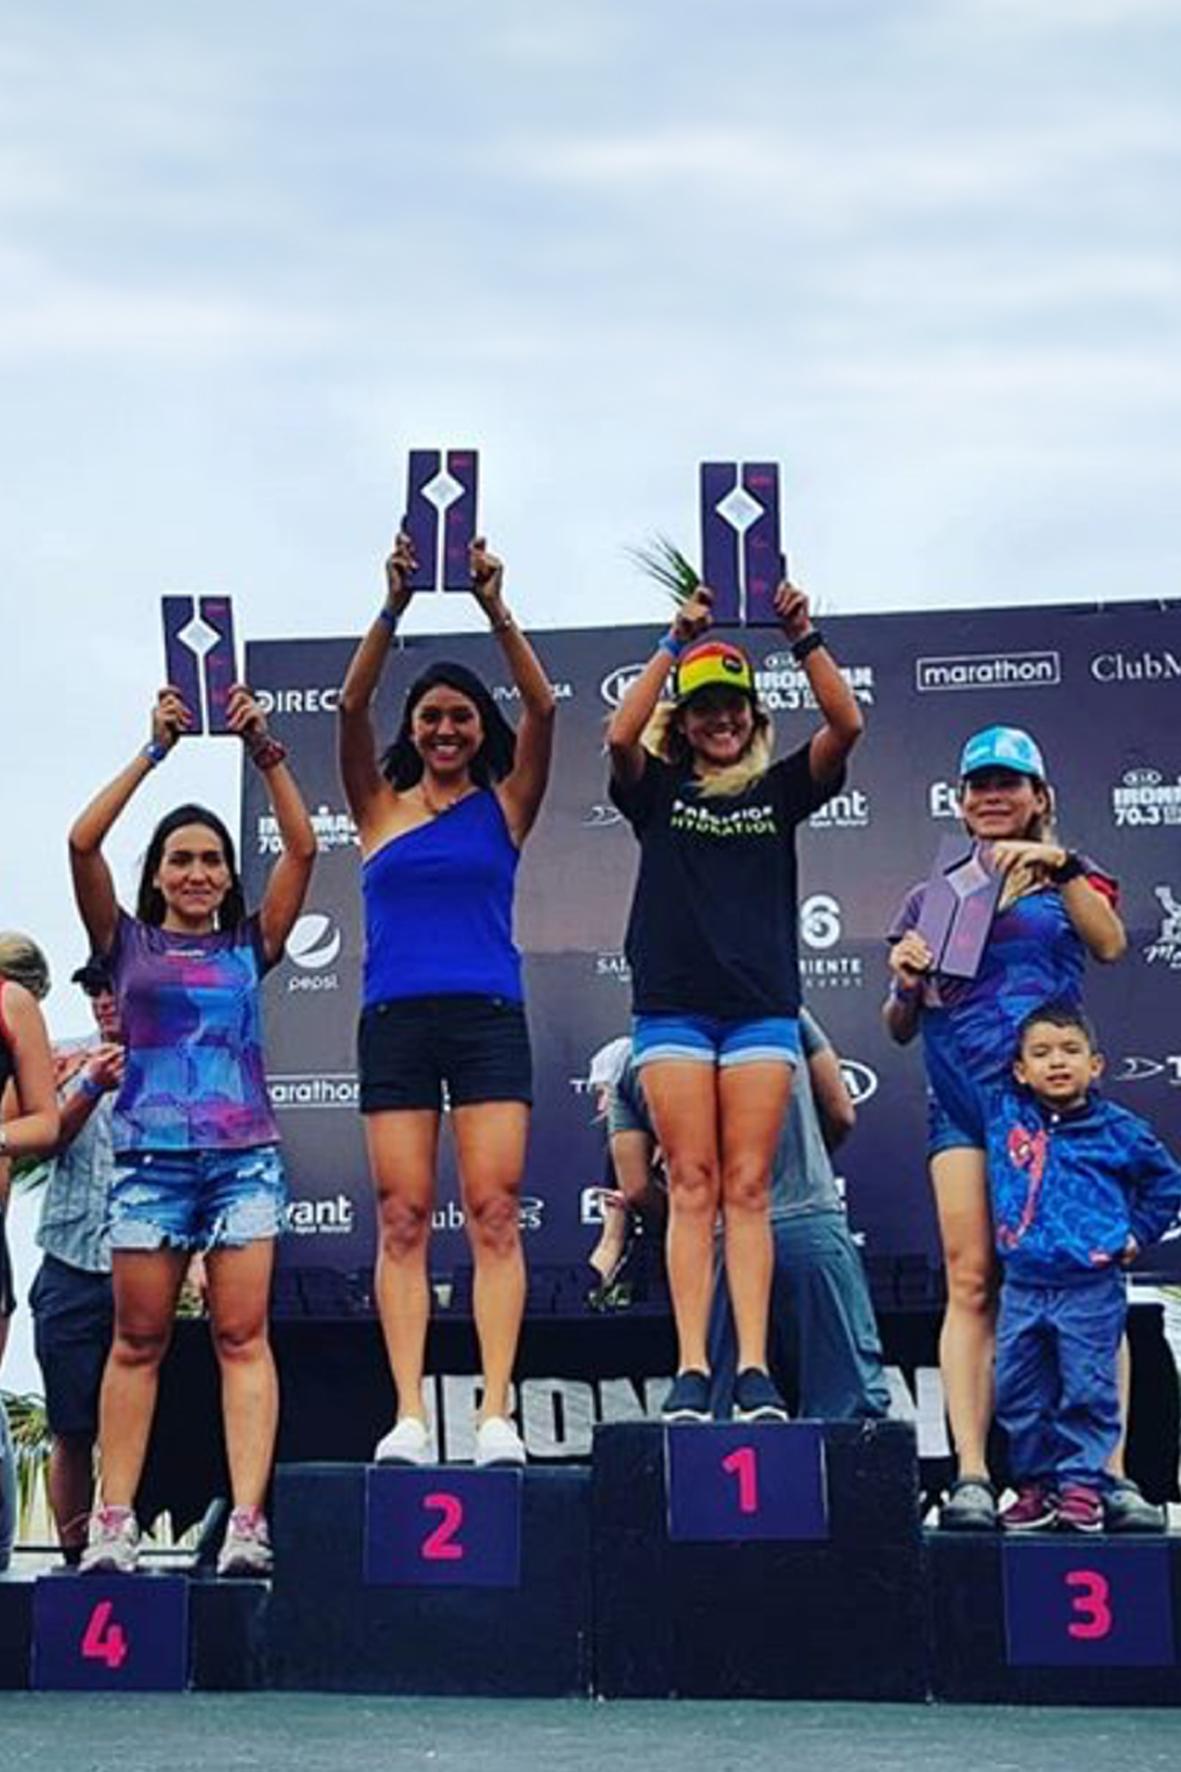 Trofeos01.jpg